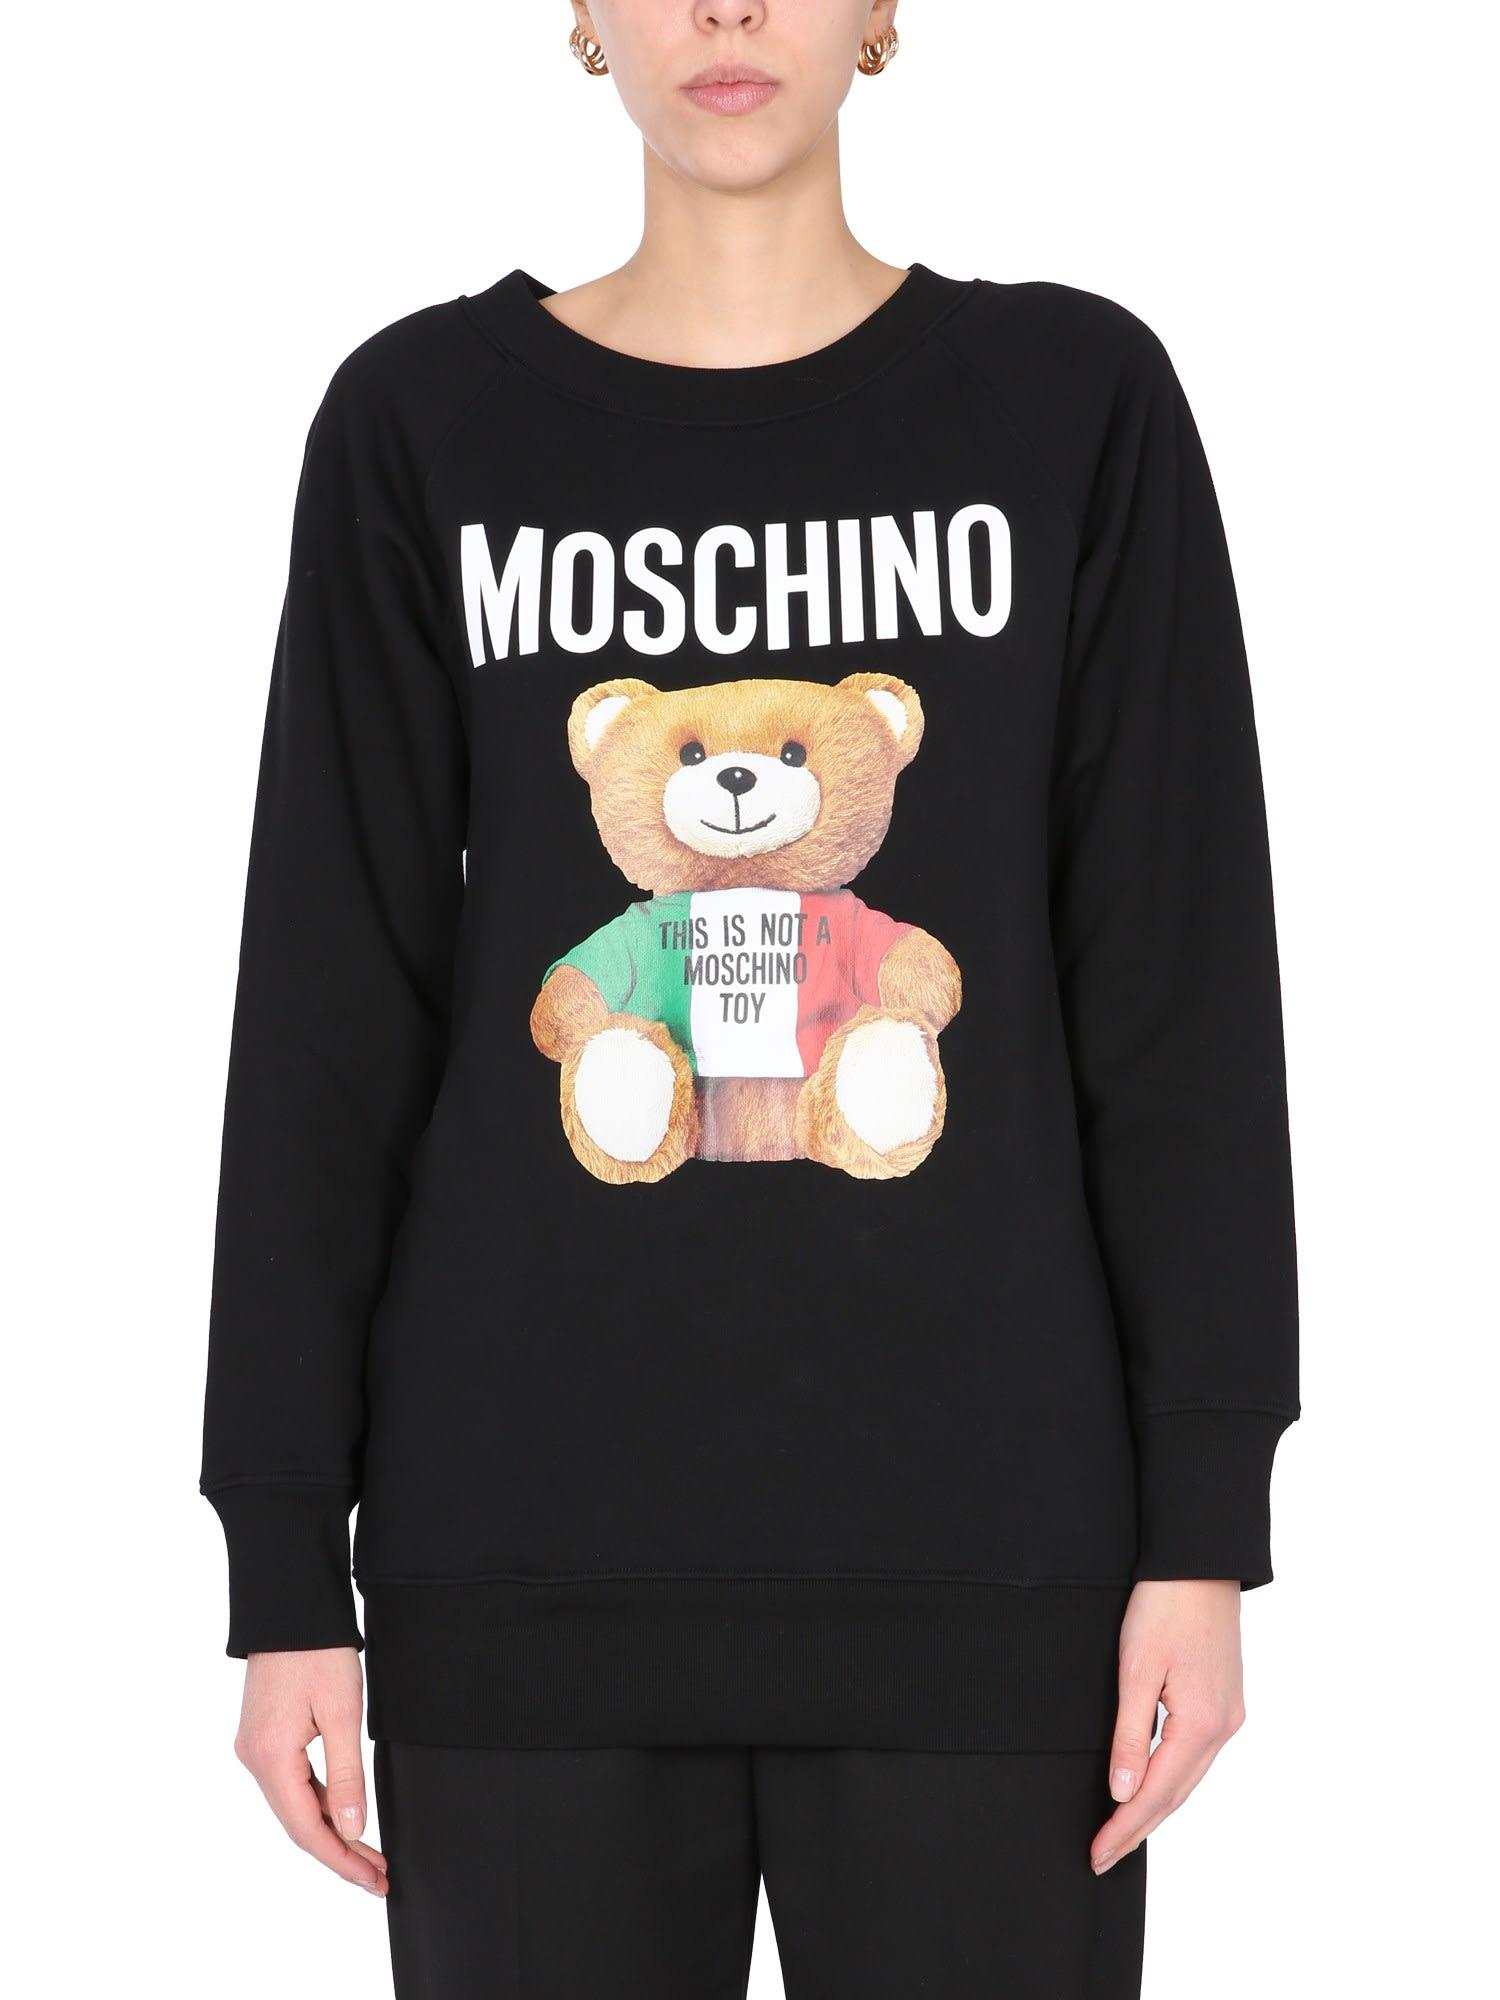 MOSCHINO SWEATSHIRT WITH ITALIAN TEDDY PRINT